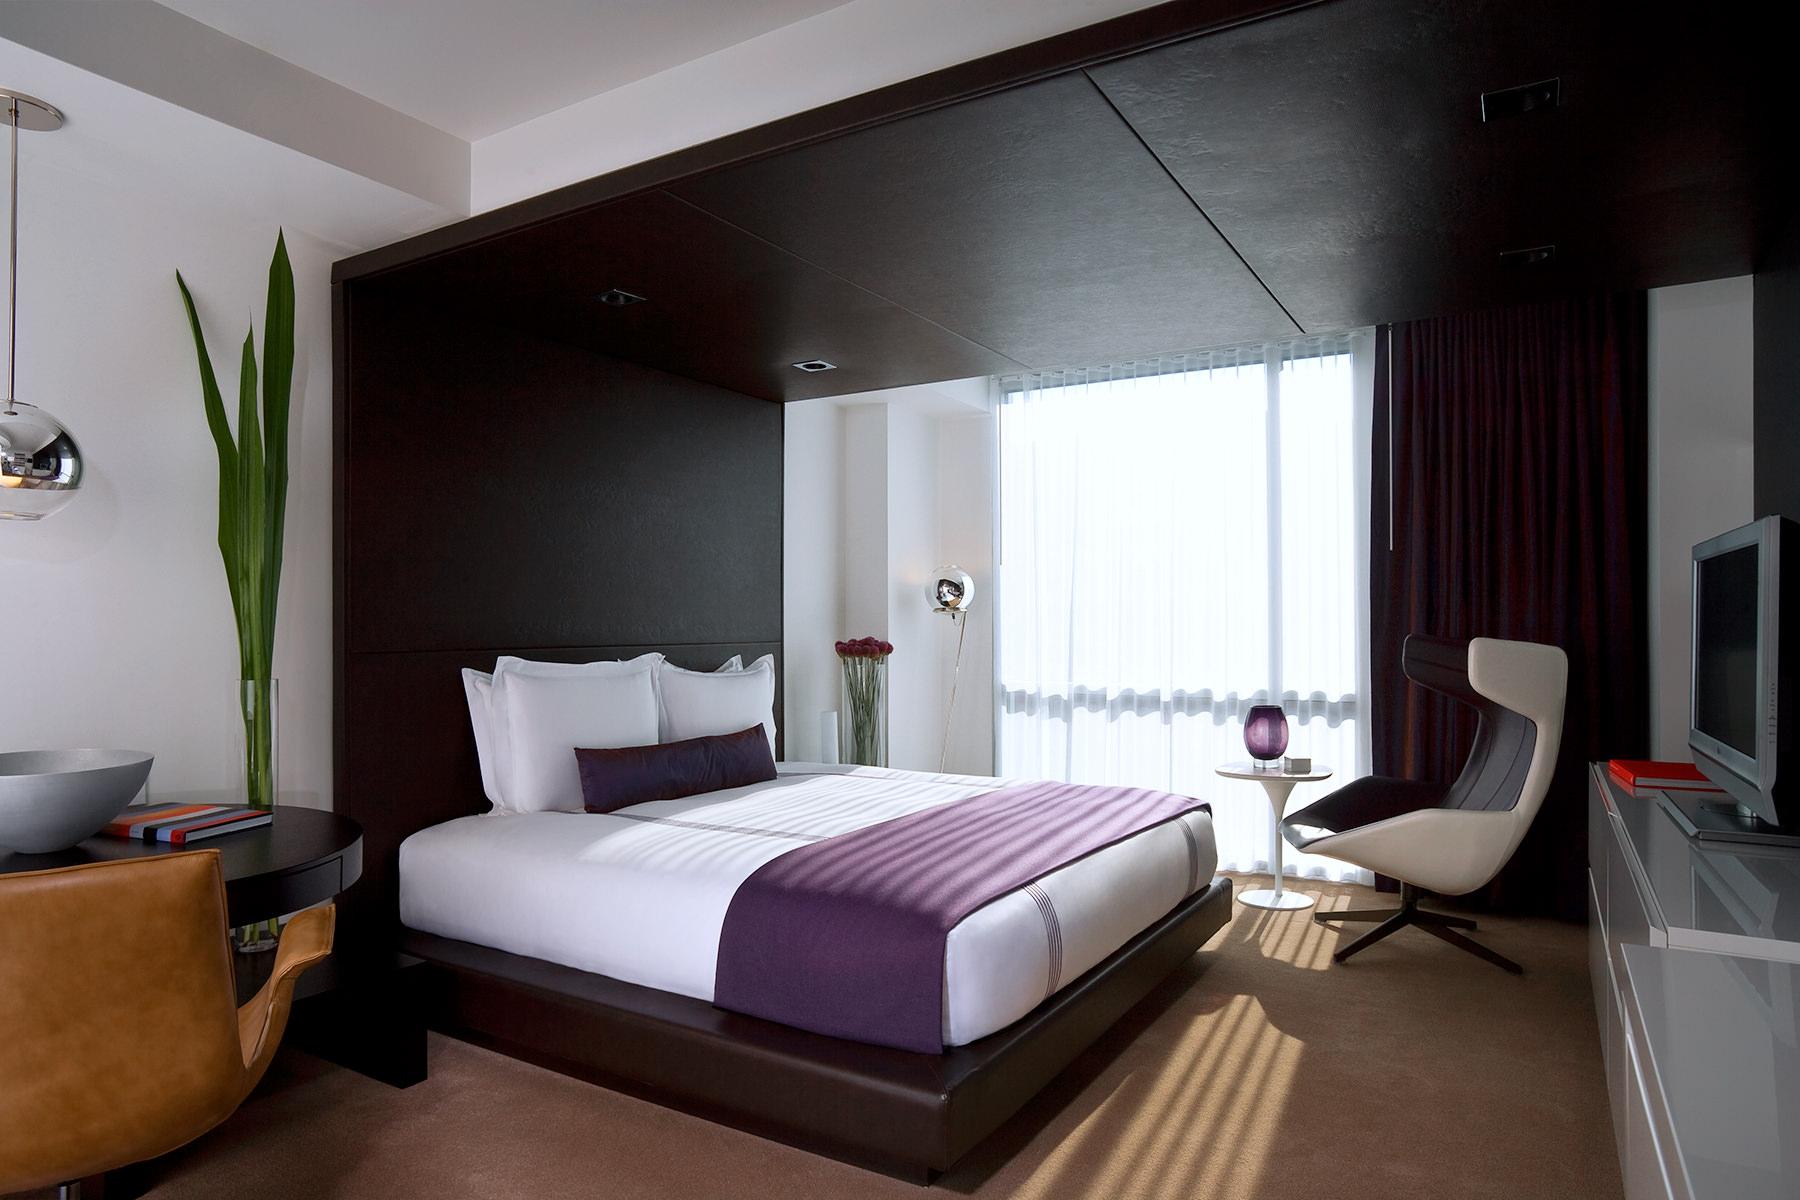 Gaszton_Hotel-Photographer_Thompson_DonovanHouse_WashingtonDC_1396.jpg